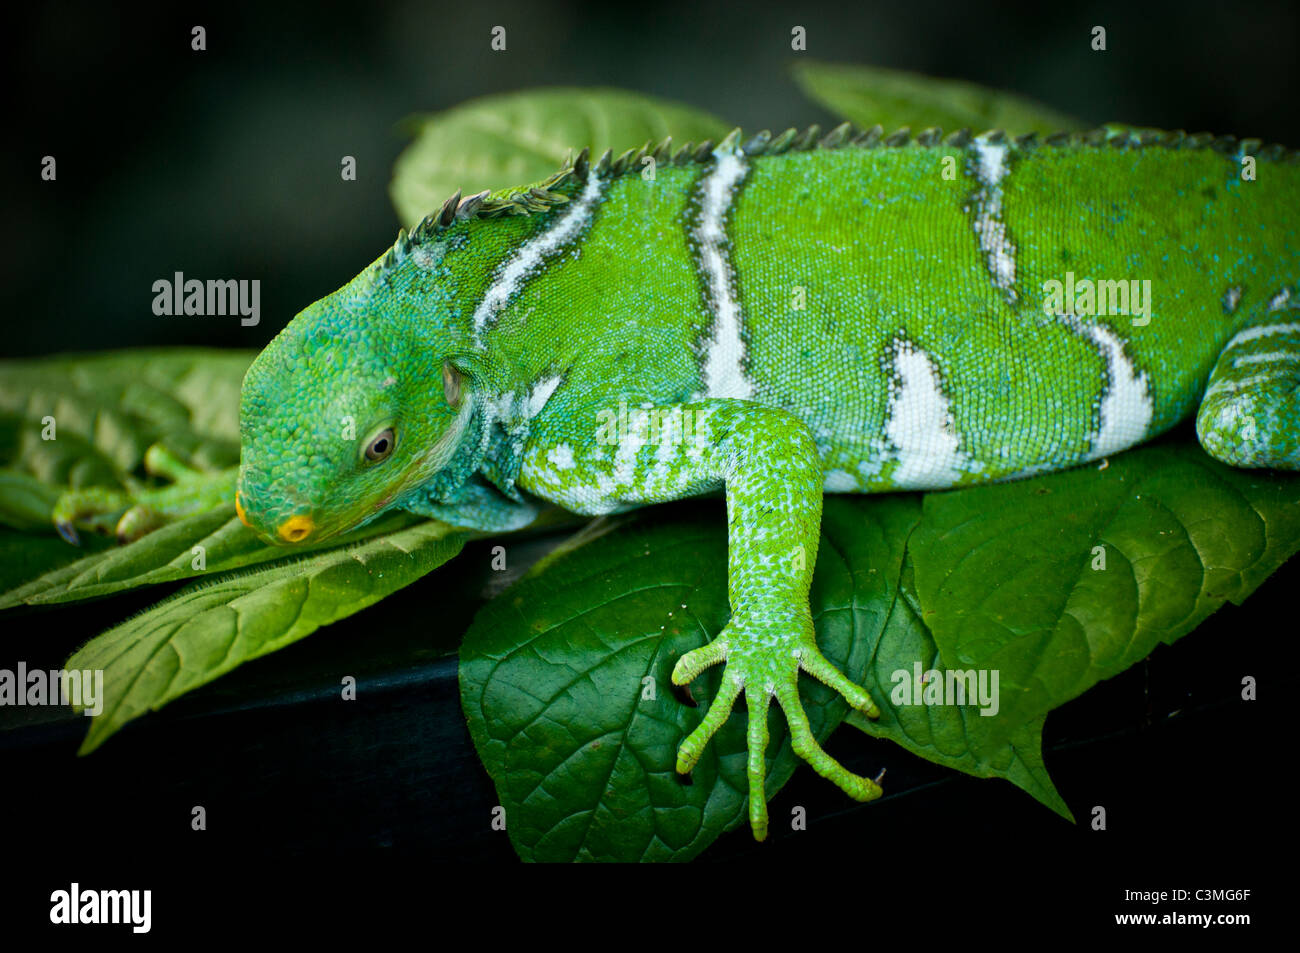 Crested Iguana, Kula Eco Park, Sigatoka ,Coral Coast, Viti Levu Island, Fiji - Stock Image